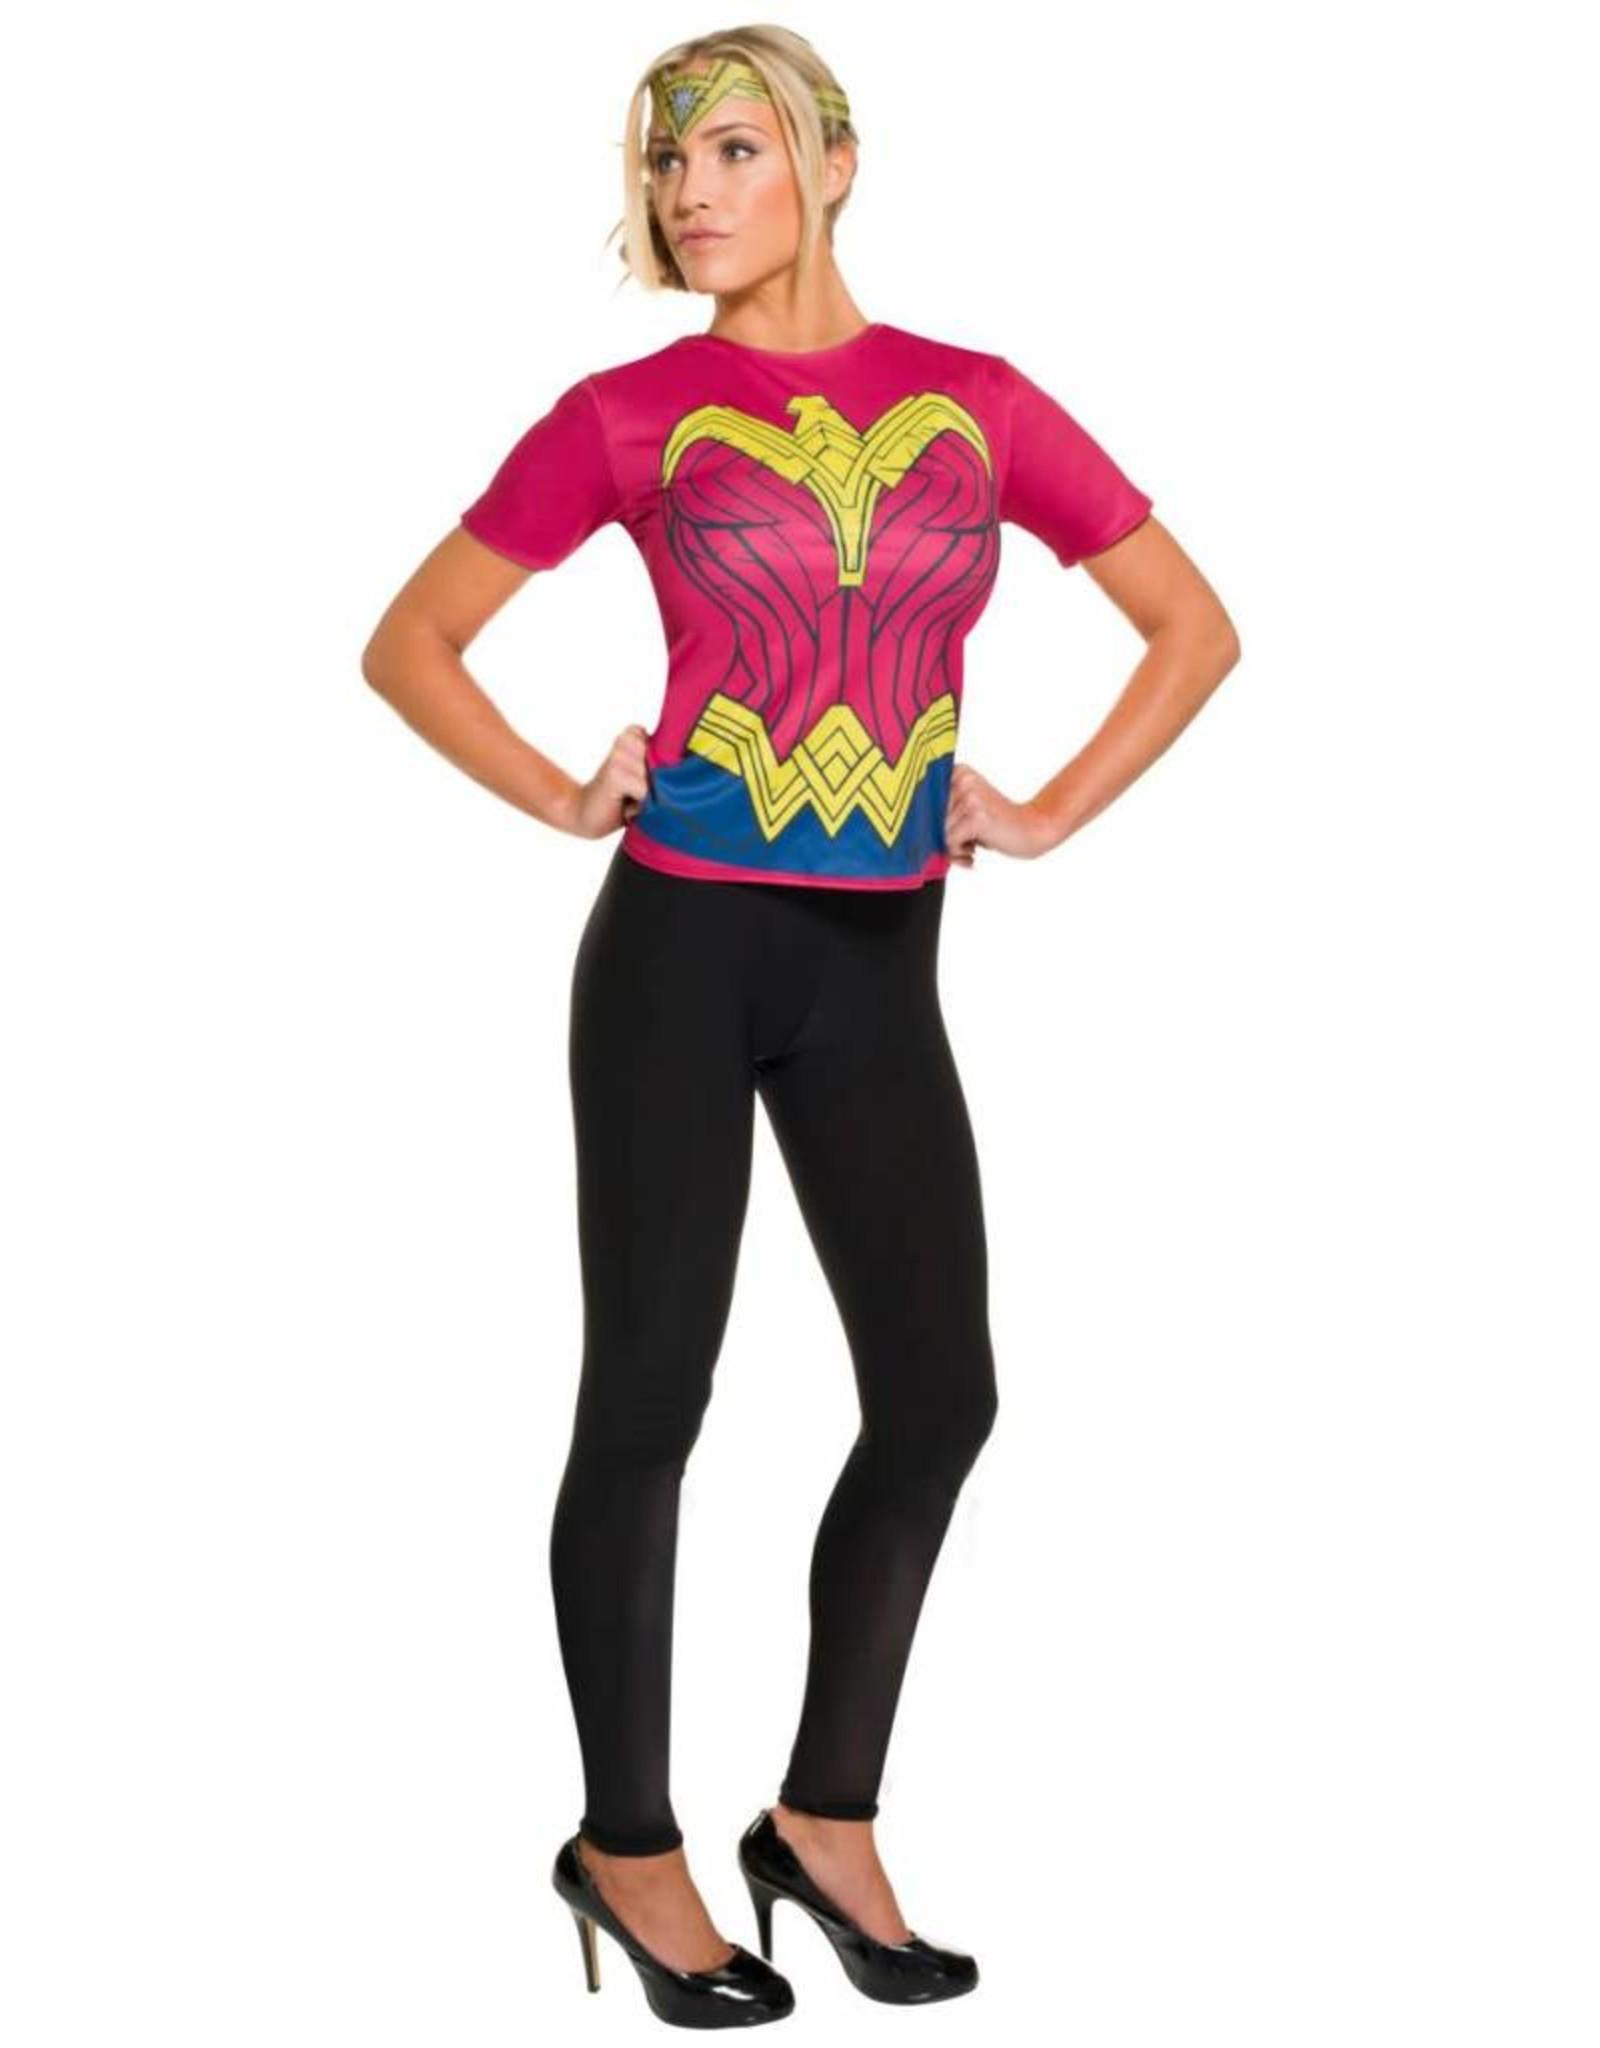 Rubies Costume Wonder Woman T-Shirt w/Headband - Batman V Superman